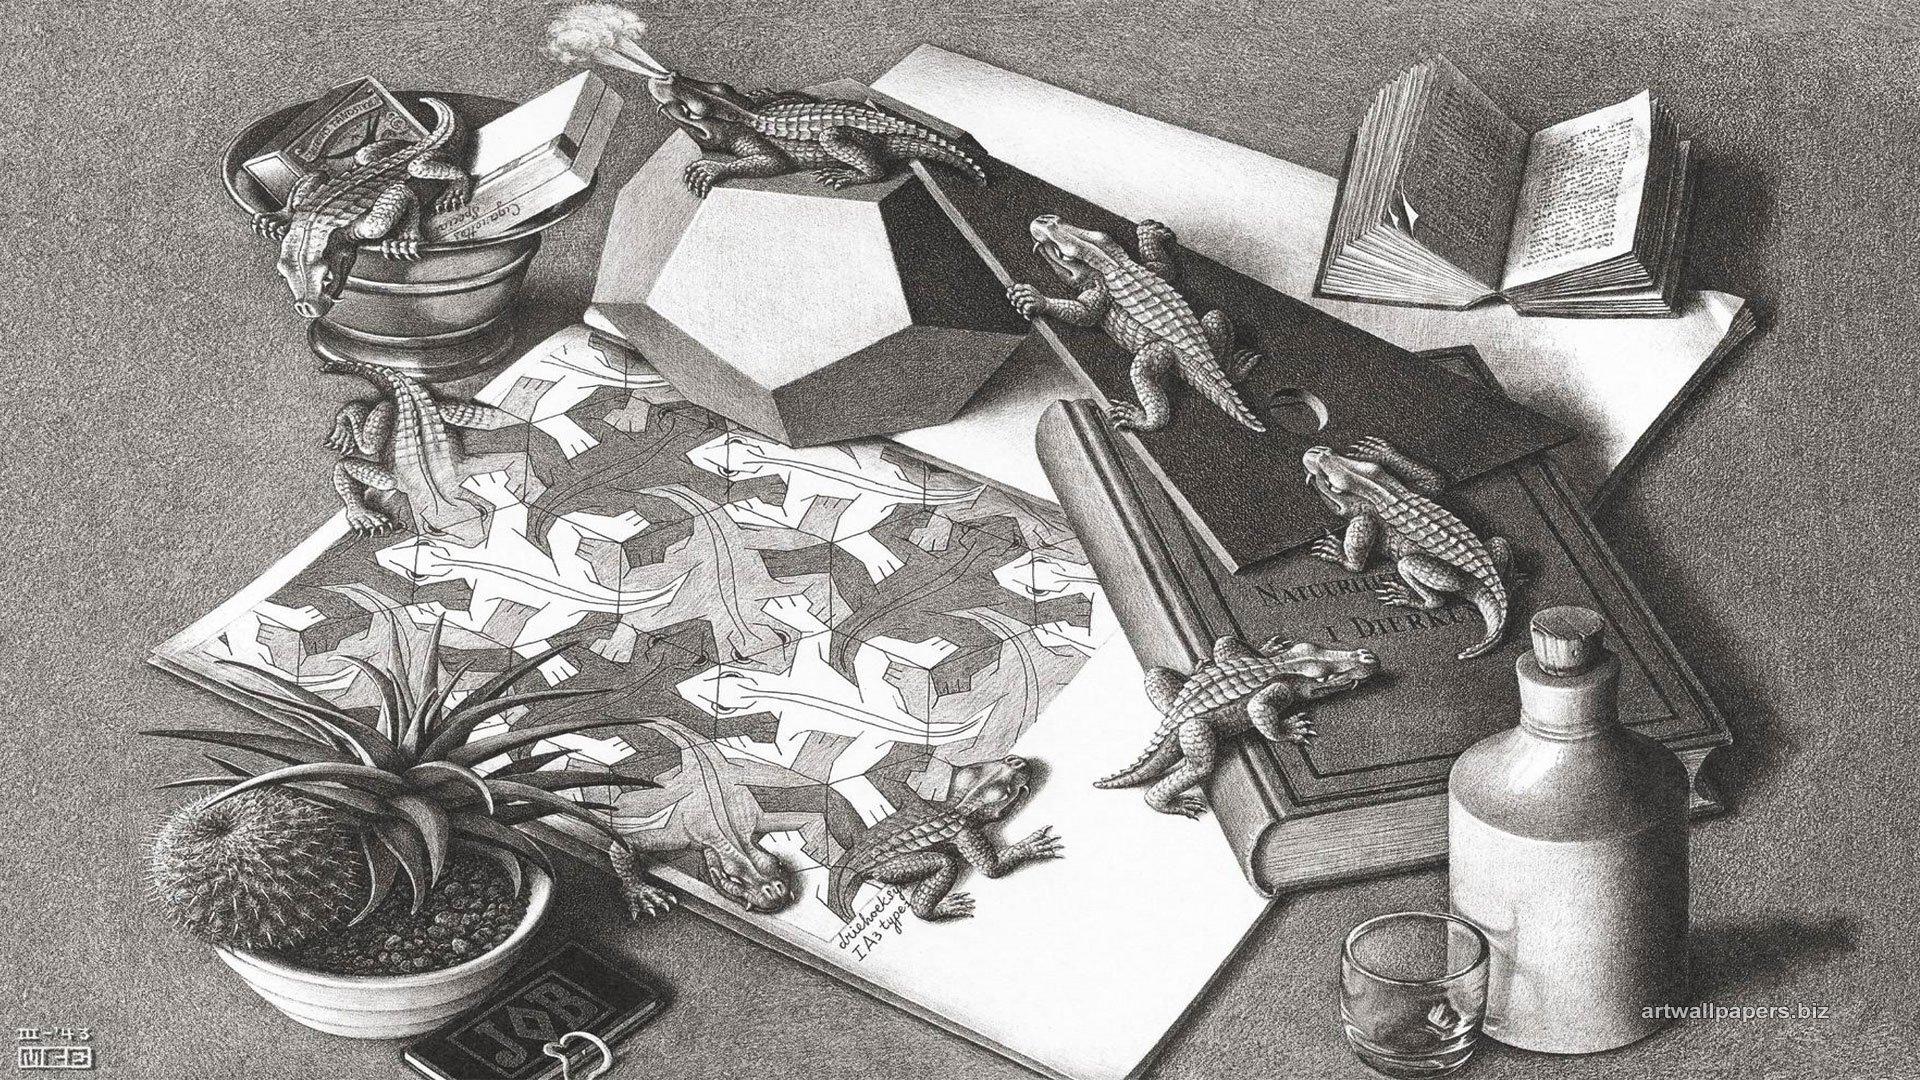 Mcエッシャー爬虫類 Mcエッシャー壁紙 1600x900 Wallpapertip